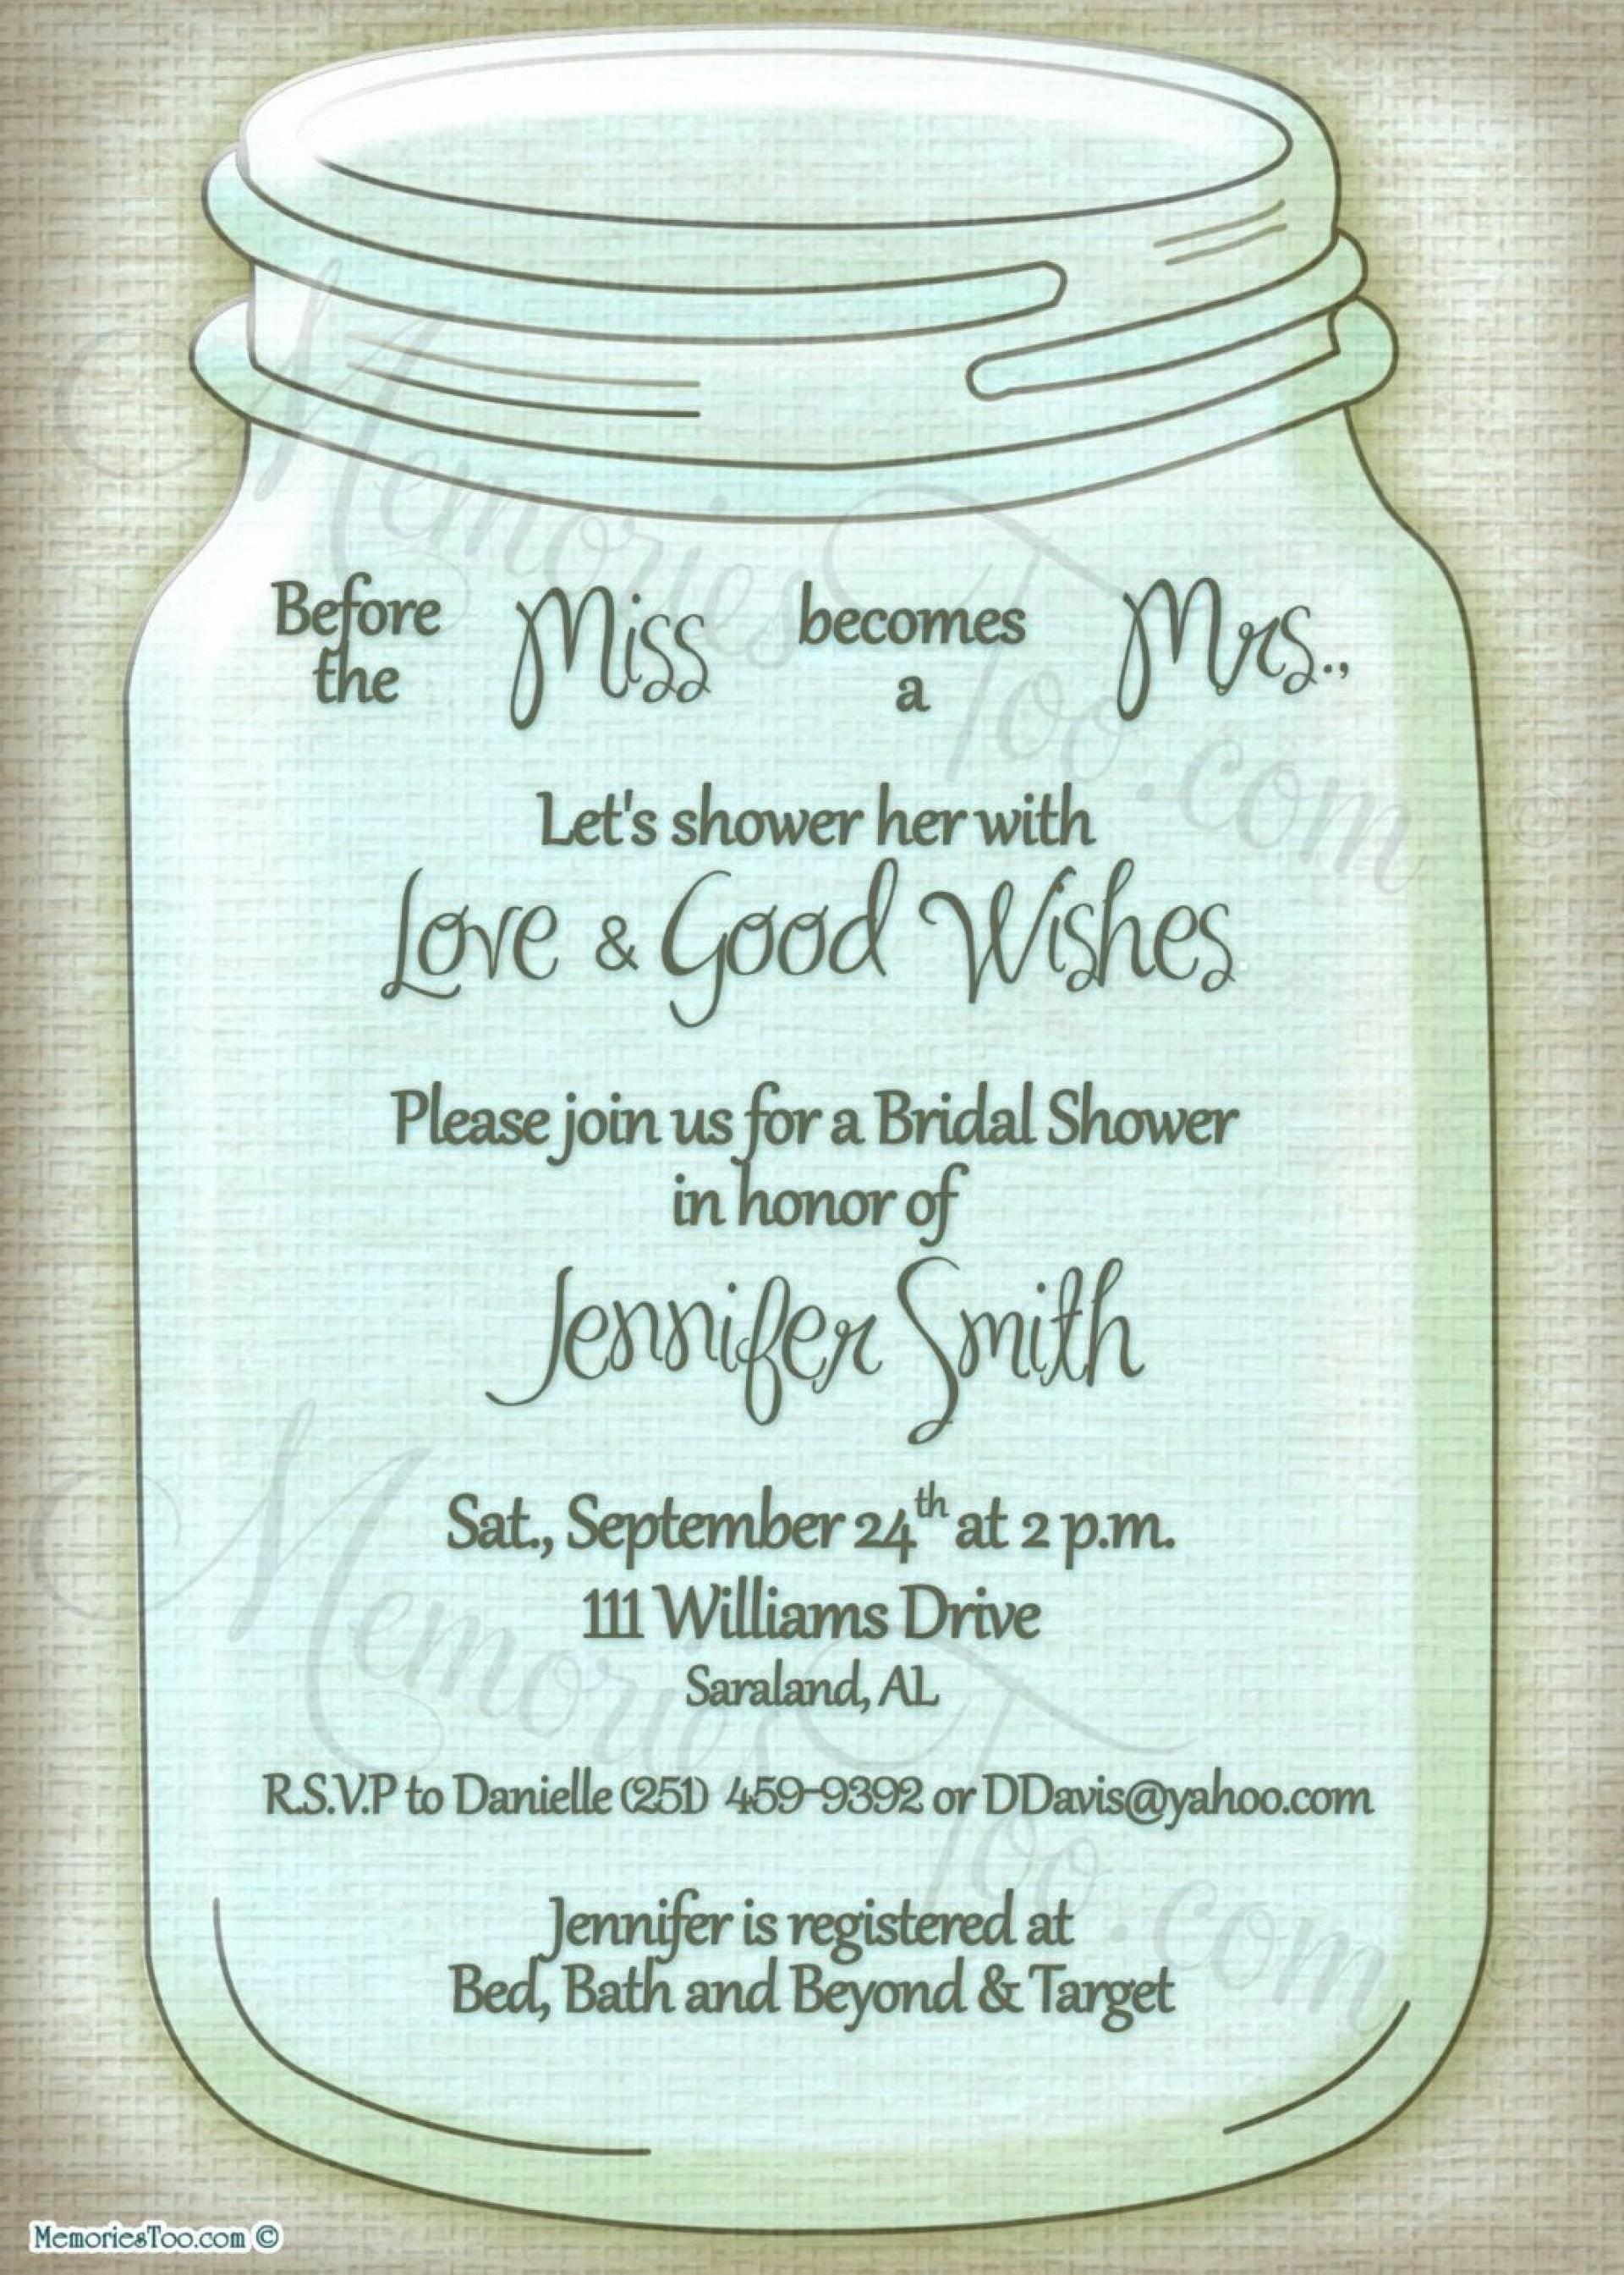 006 Top Mason Jar Invitation Template Image  Free Wedding Shower Rustic1920